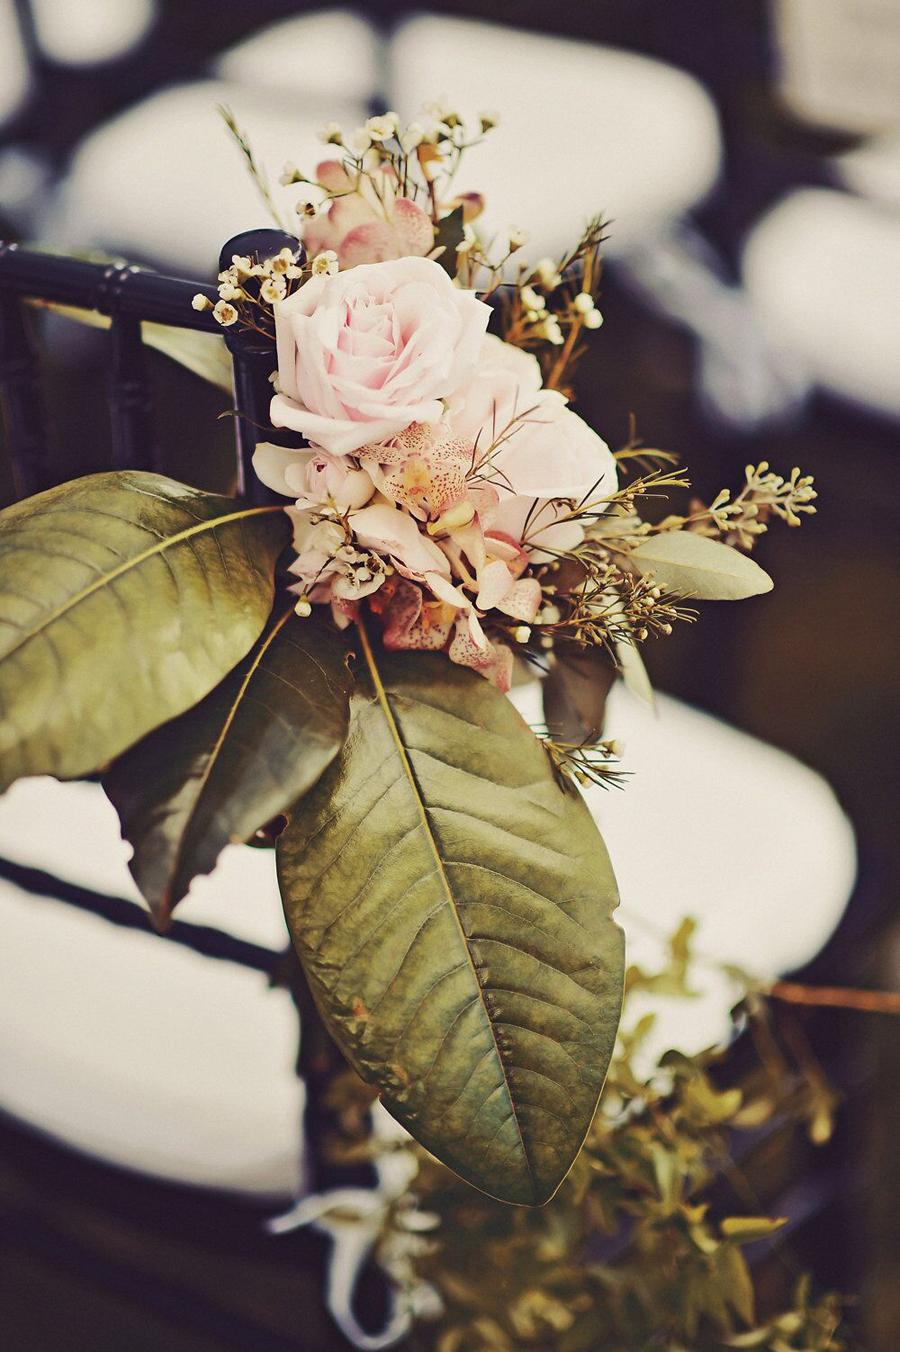 Floral, Floral Design, Blooms, Wedding, Wedding Day